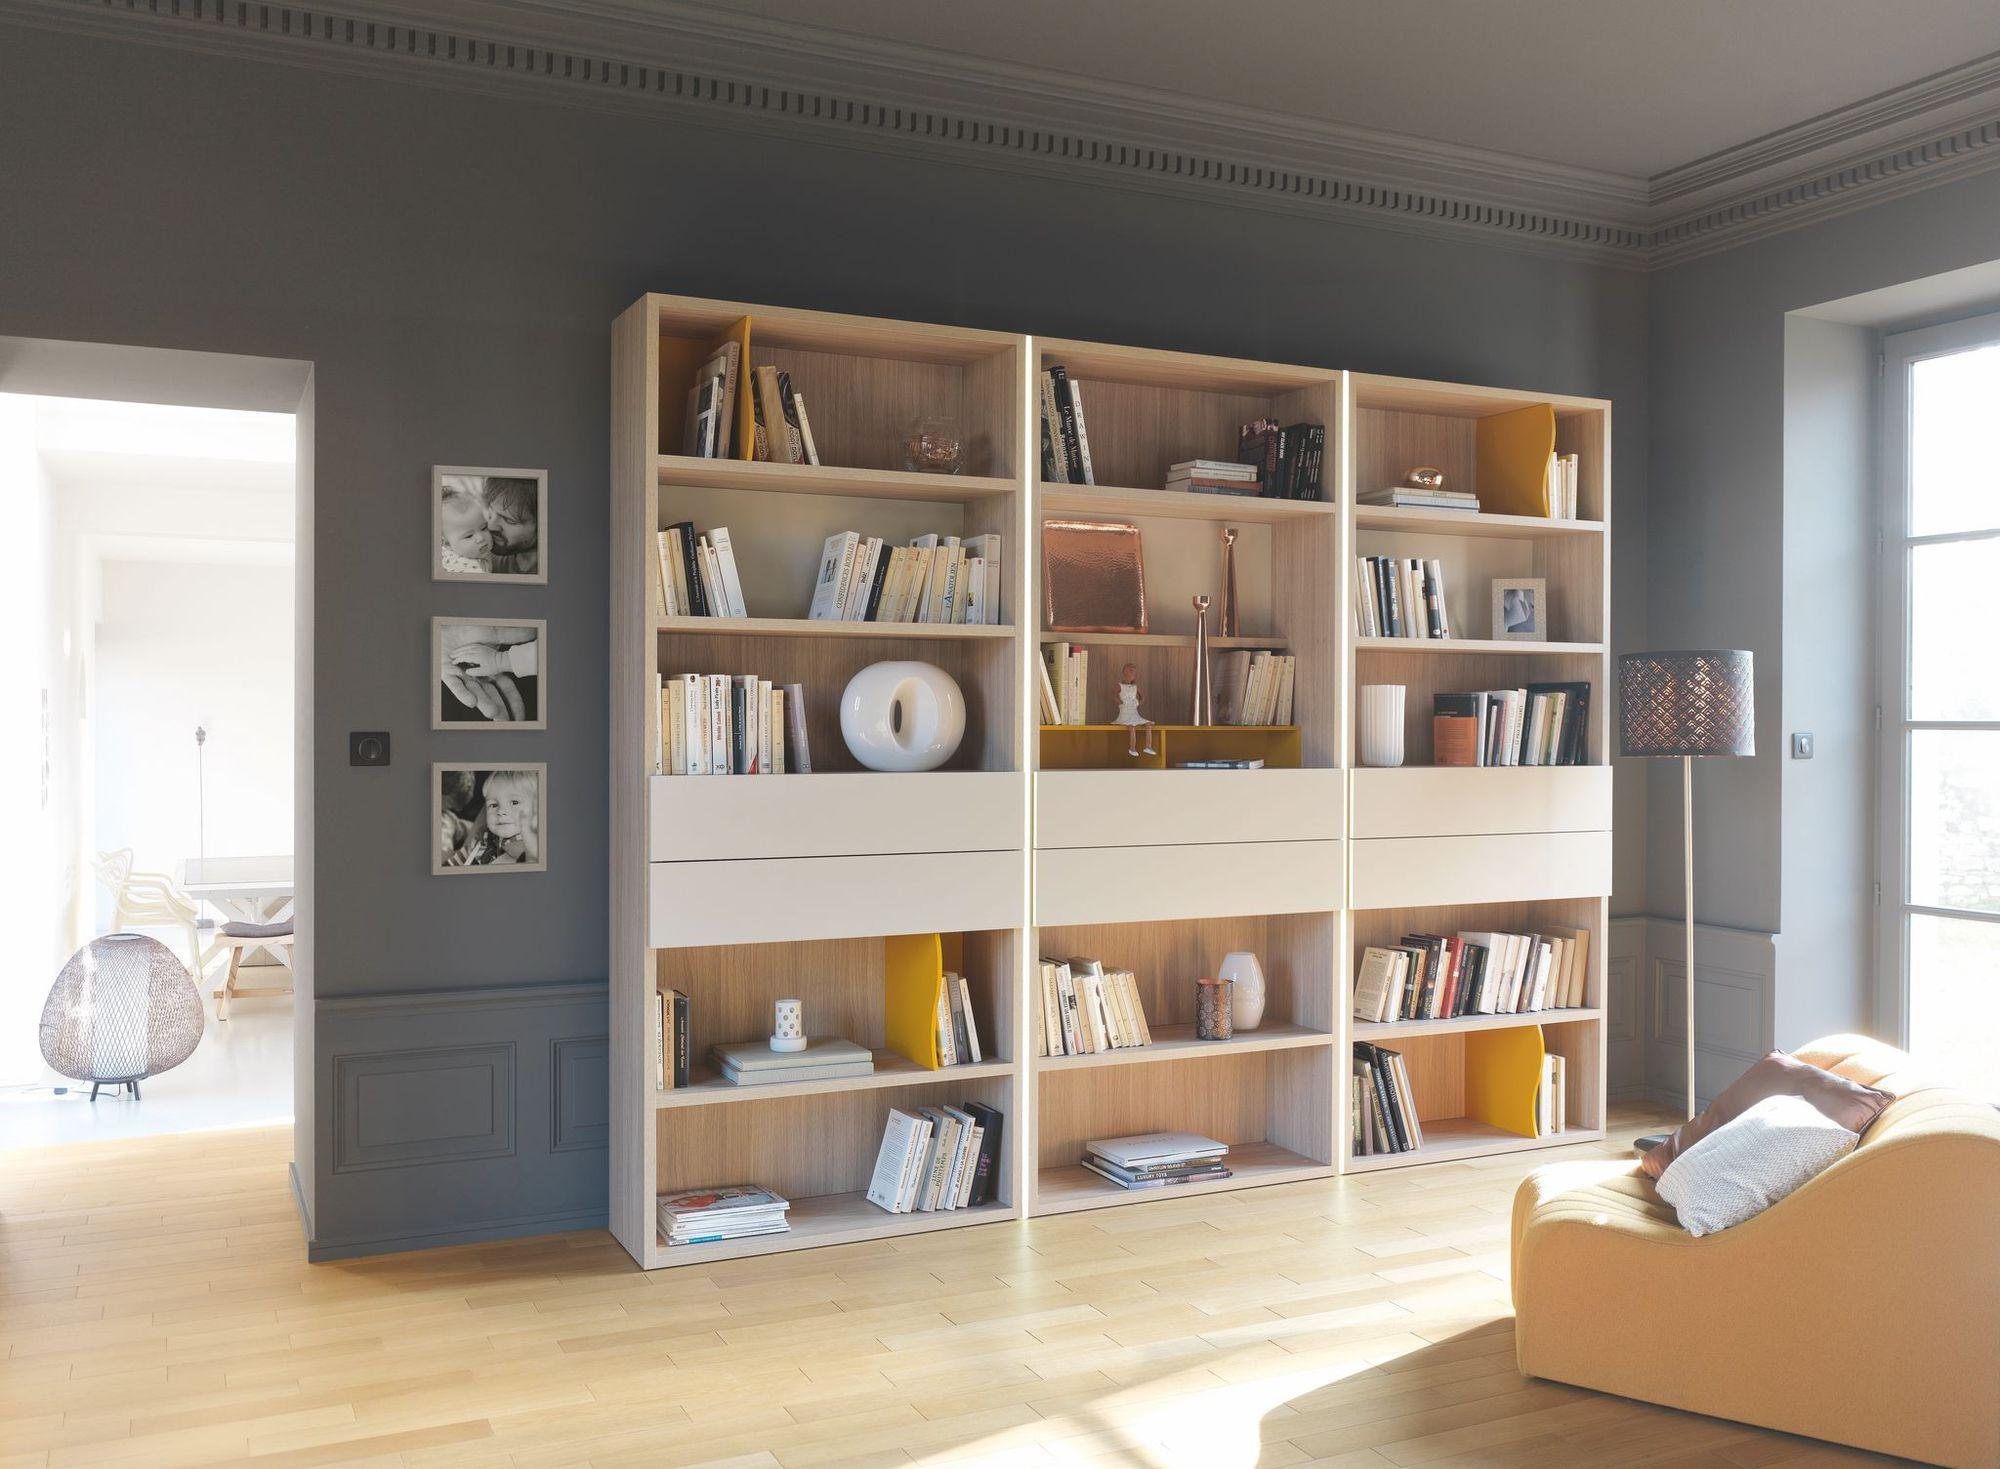 Rangement livres : meubles pratiques et originaux  インテリア